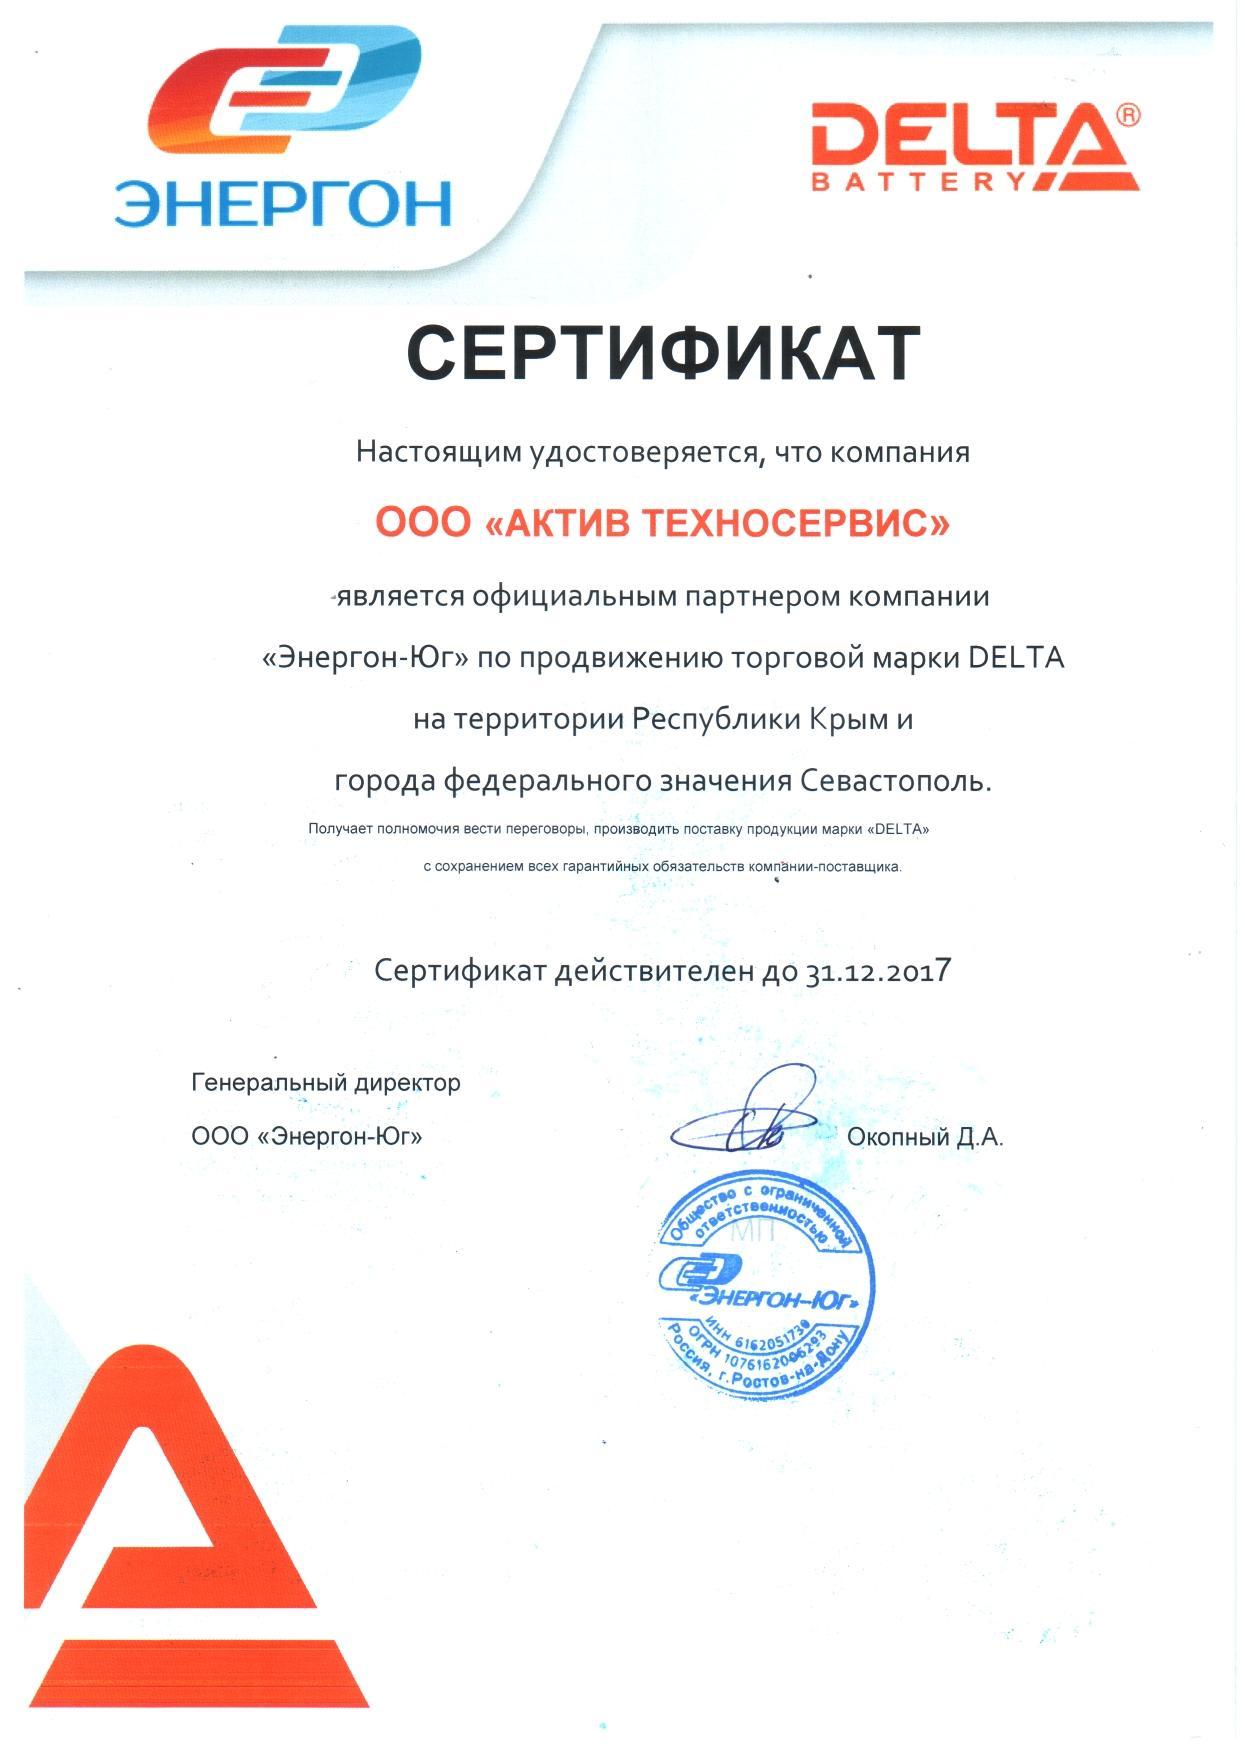 сертификат DELTA 2017.jpg